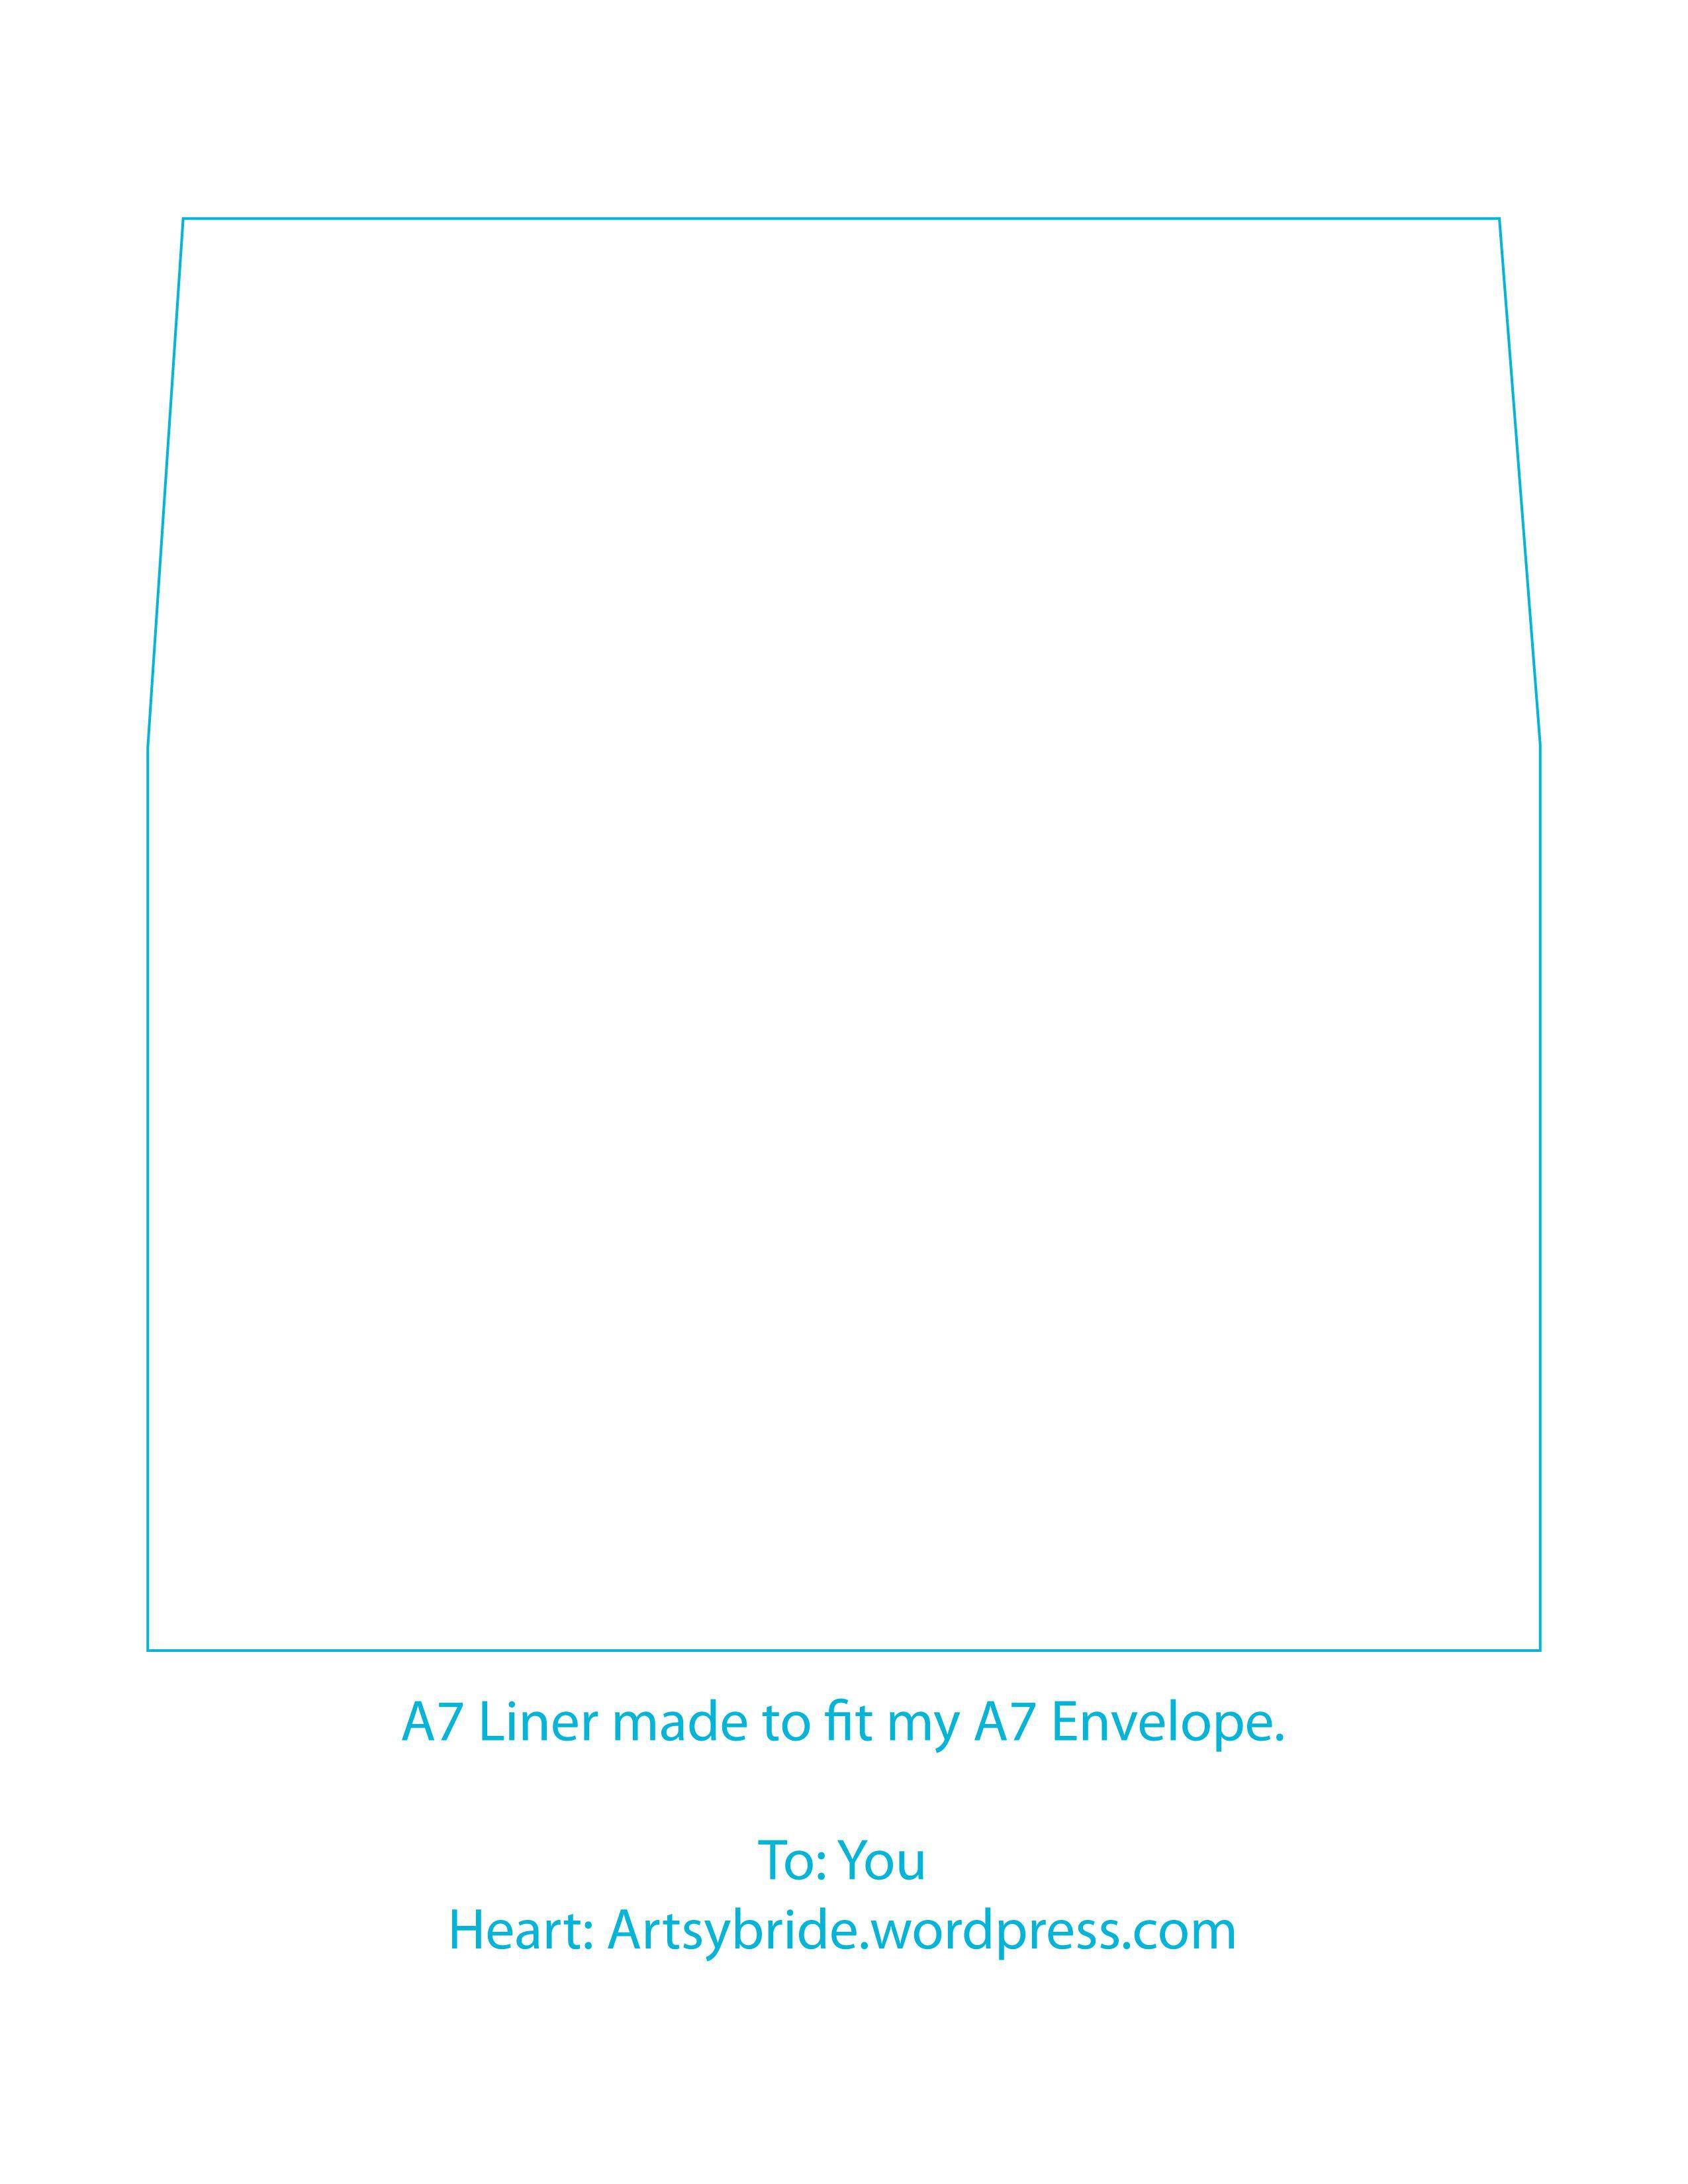 003 Sensational A7 Square Flap Envelope Liner Template Inspiration Full